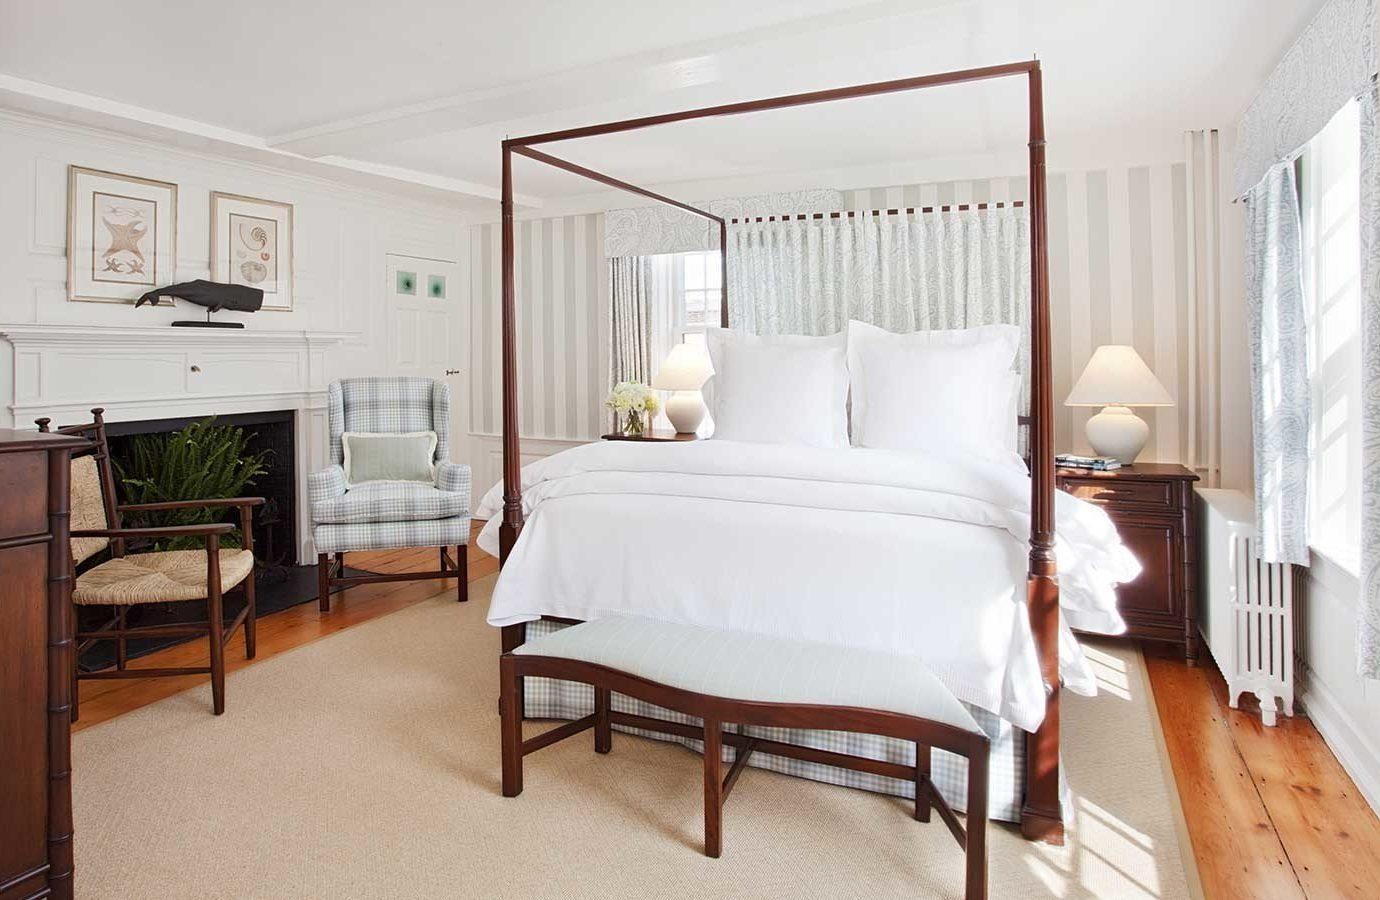 Hotels floor indoor wall bed room property Bedroom bed frame window interior design real estate home Suite white furniture hardwood ceiling flooring wood flooring estate